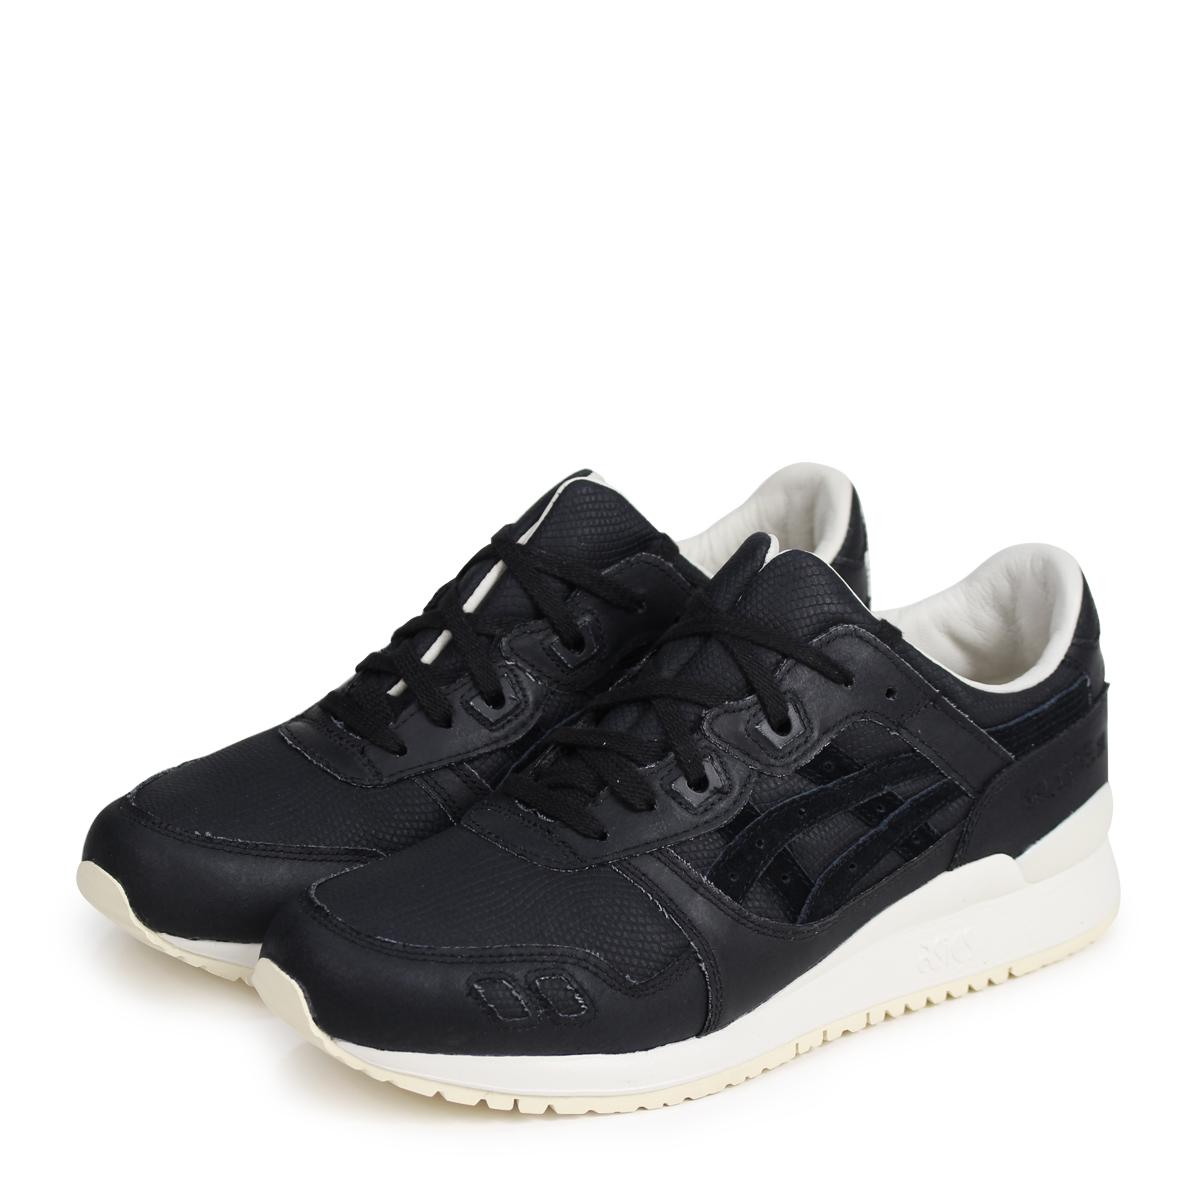 the best attitude 229fc c6aa0 asics Tiger GEL-LYTE III ASICS tiger gel light 3 sneakers H842N-9090 men  black [183]